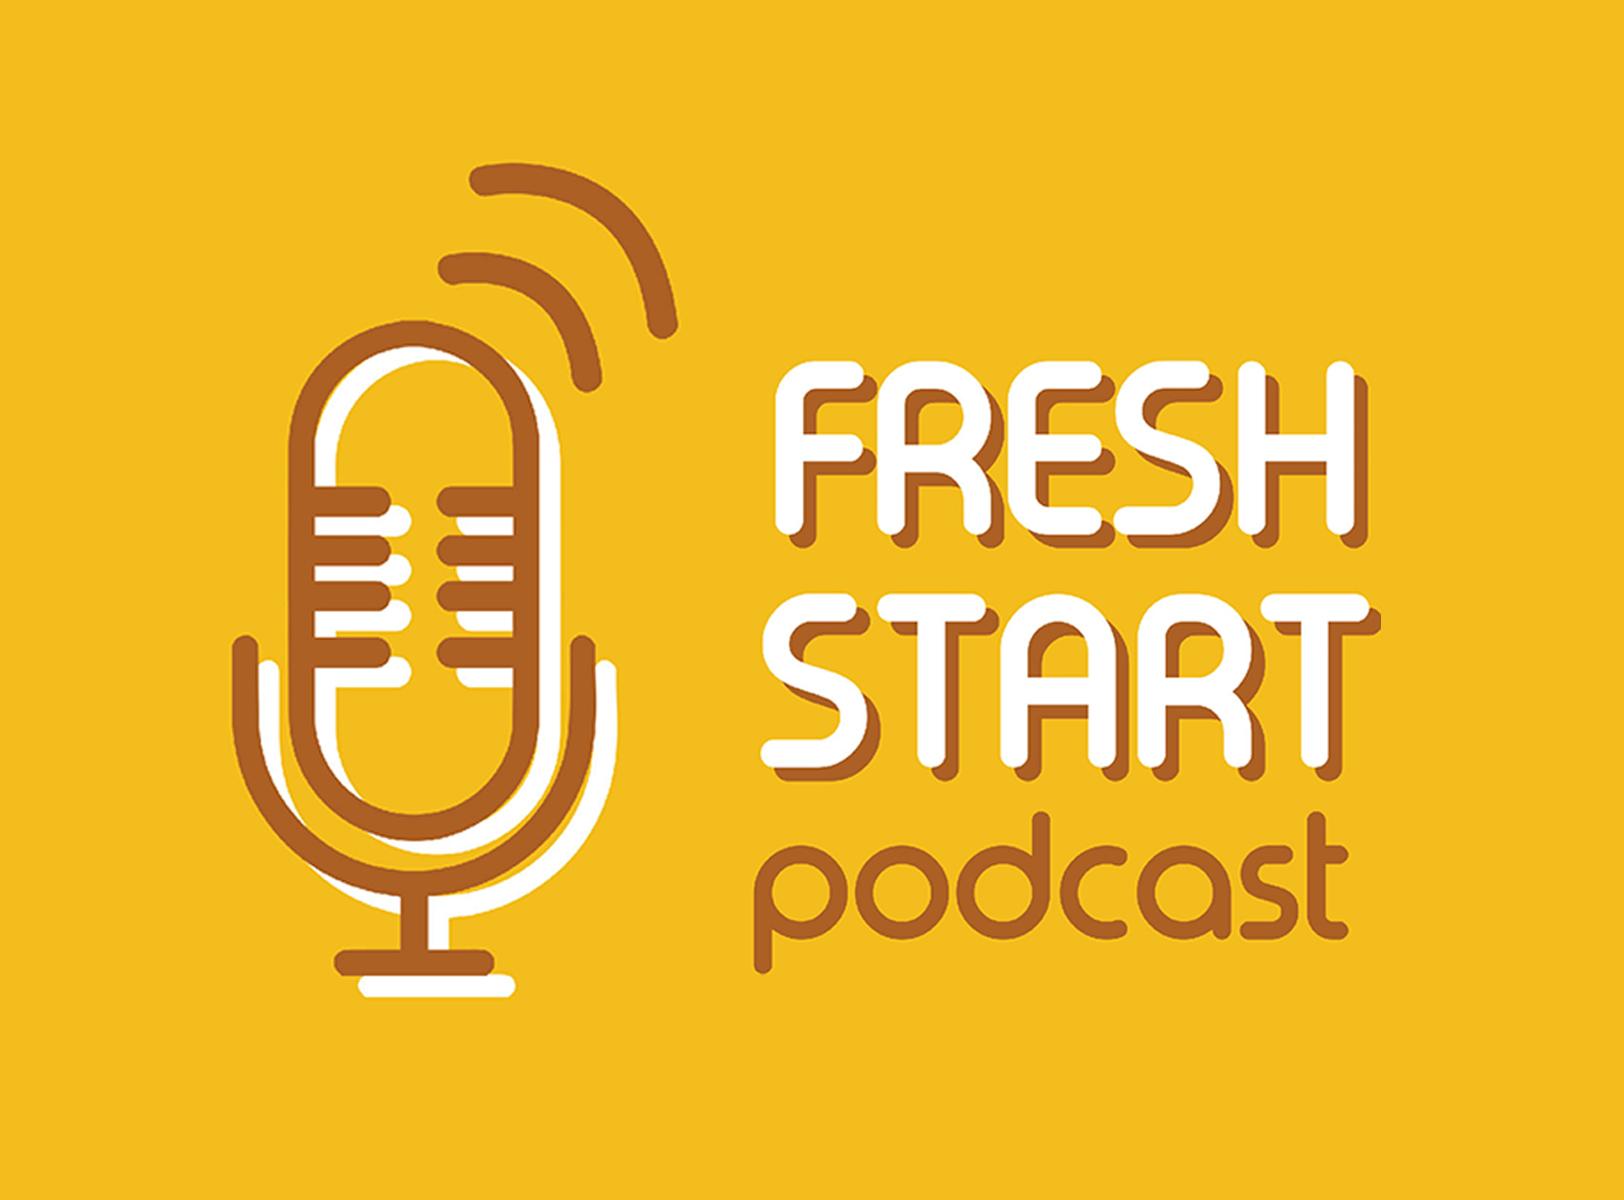 Fresh Start: Podcast News (10/17/2019 Thu.)